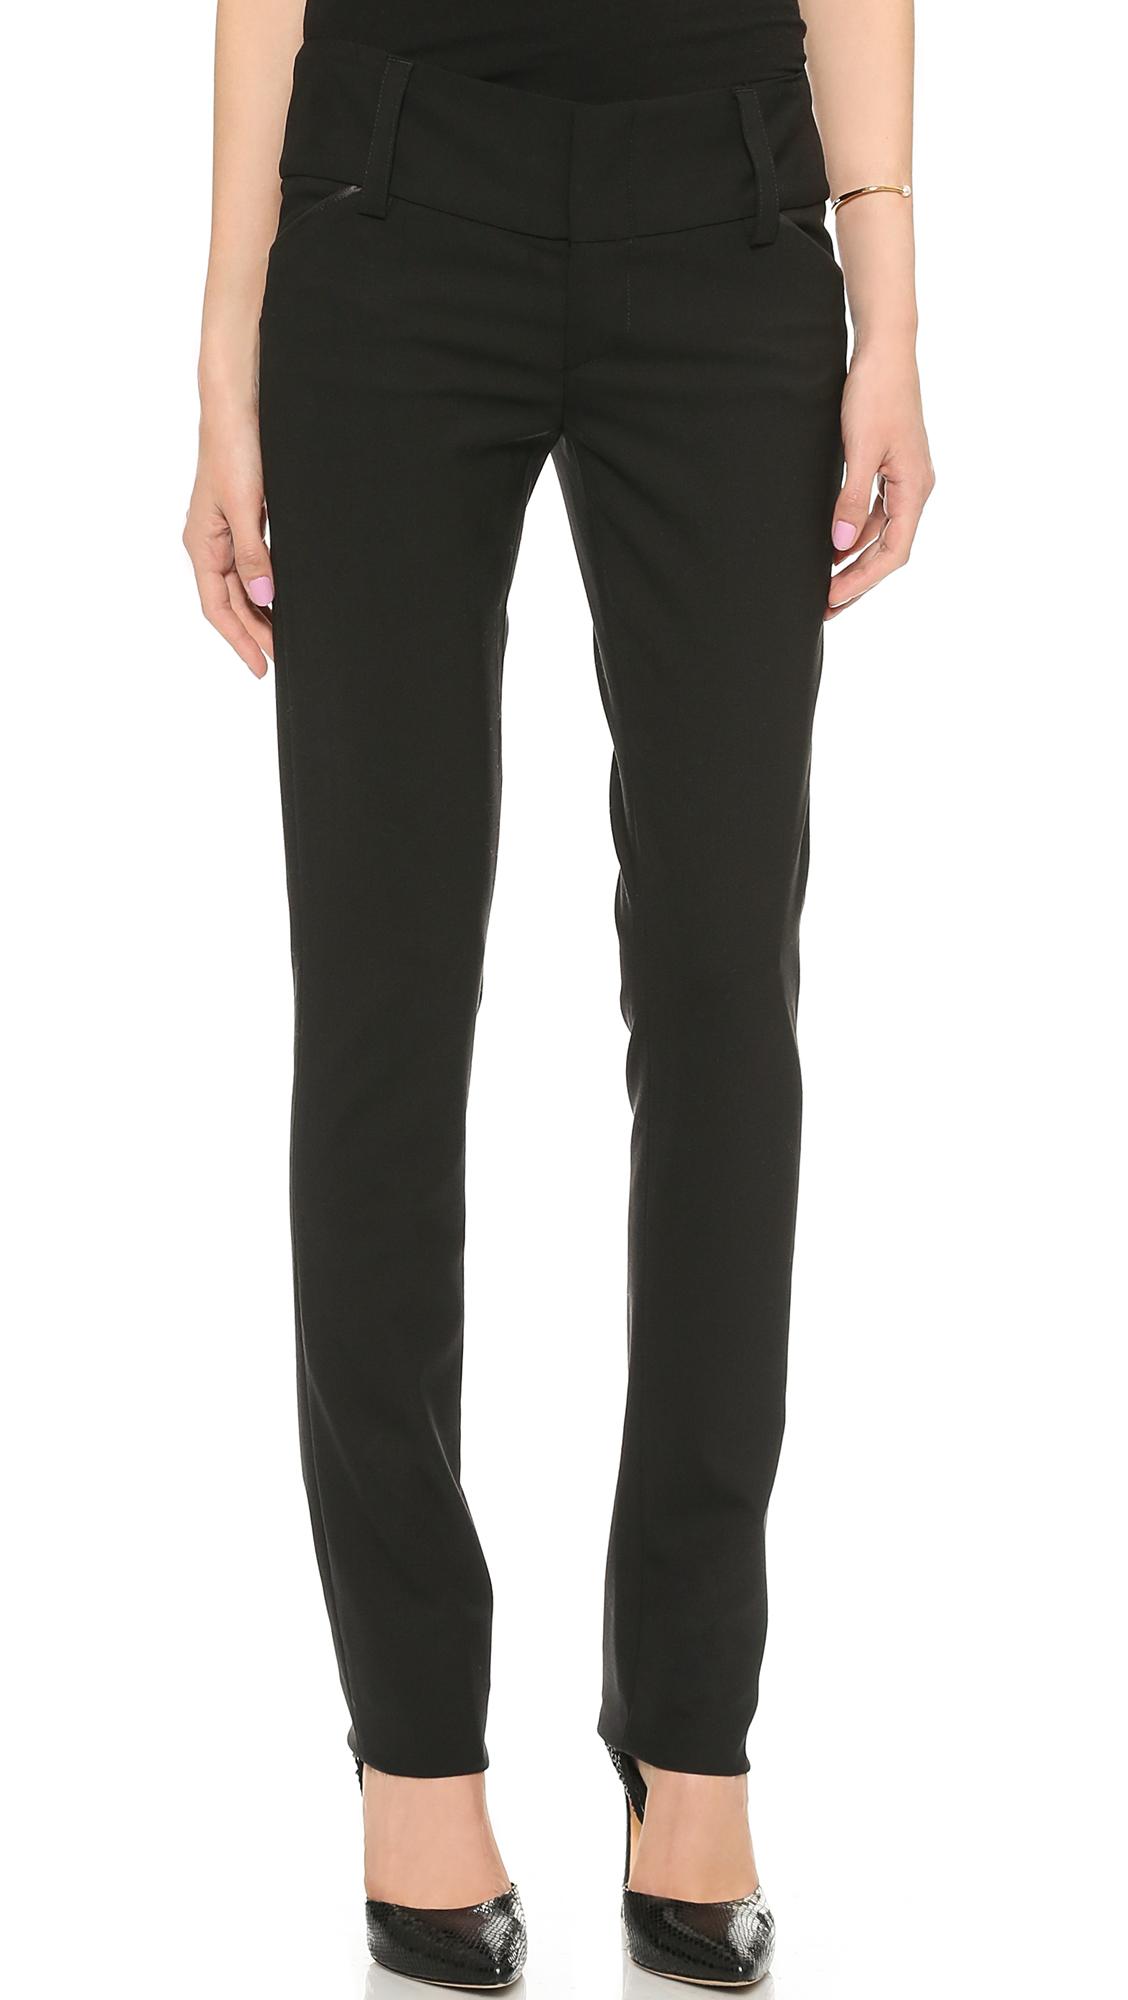 Alice + Olivia Olivia Slim Leg Pants With Wide Waistband - Black at Shopbop